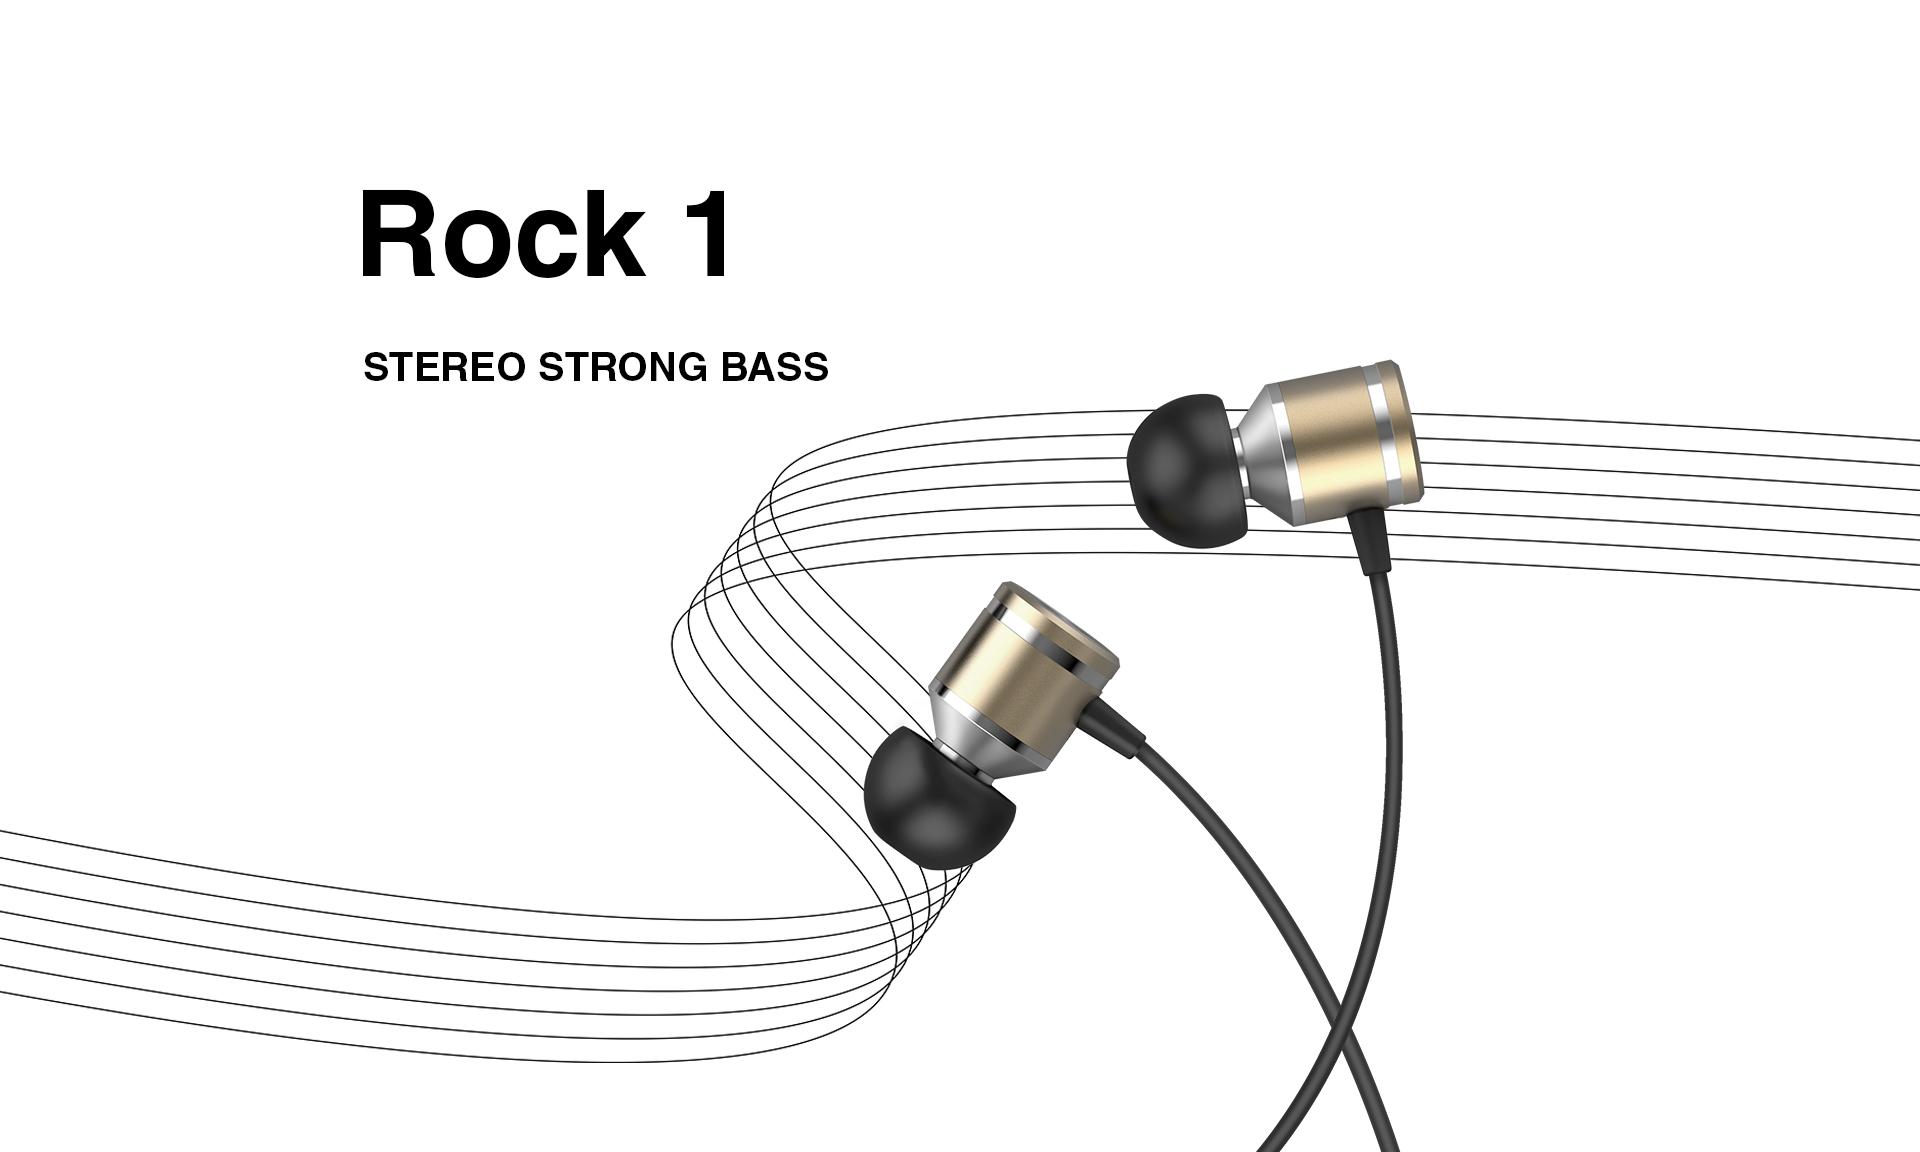 tecno rock 1